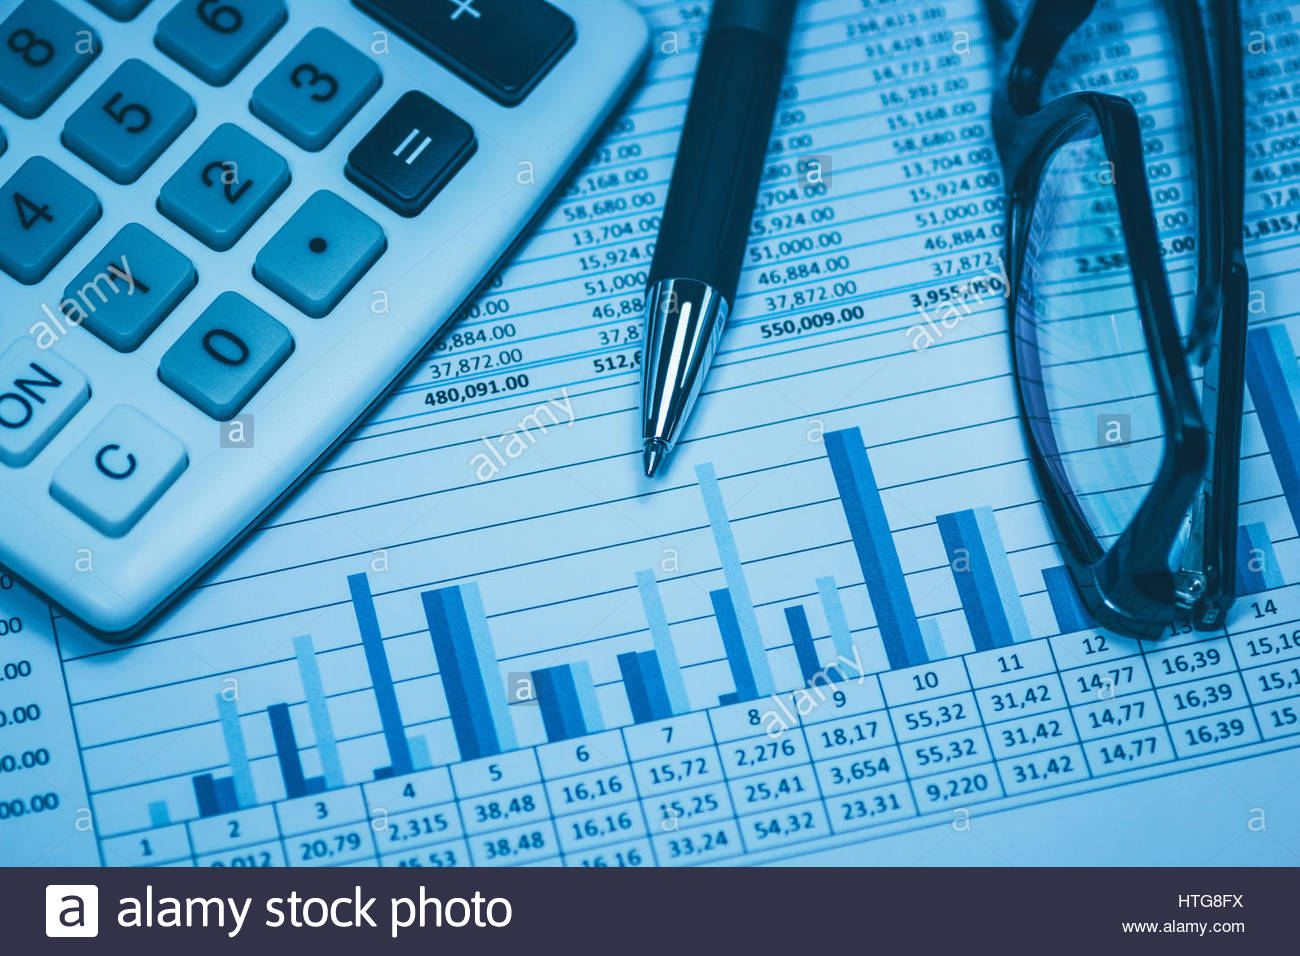 accounting financial bank banking account stock exchange spreadsheet